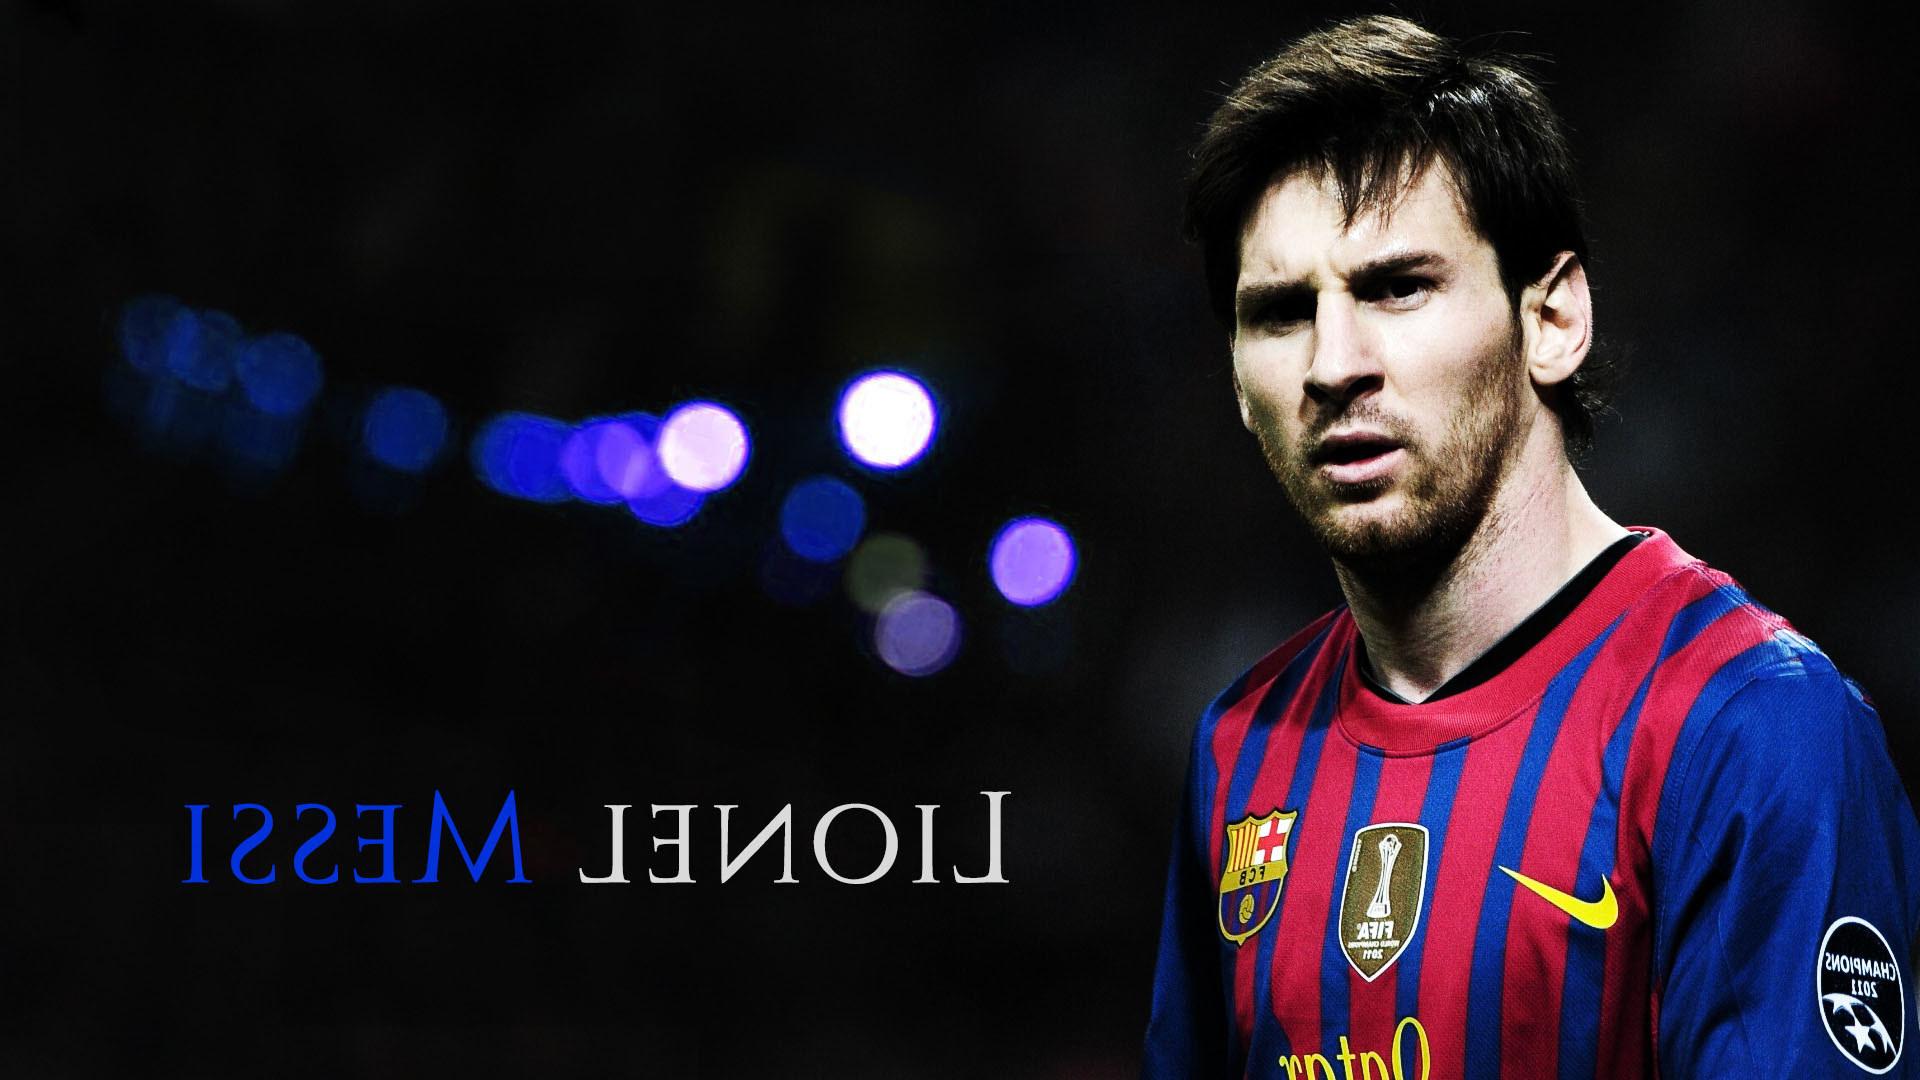 Messi Wallpaper Download Nokia 5235 , HD Wallpaper & Backgrounds